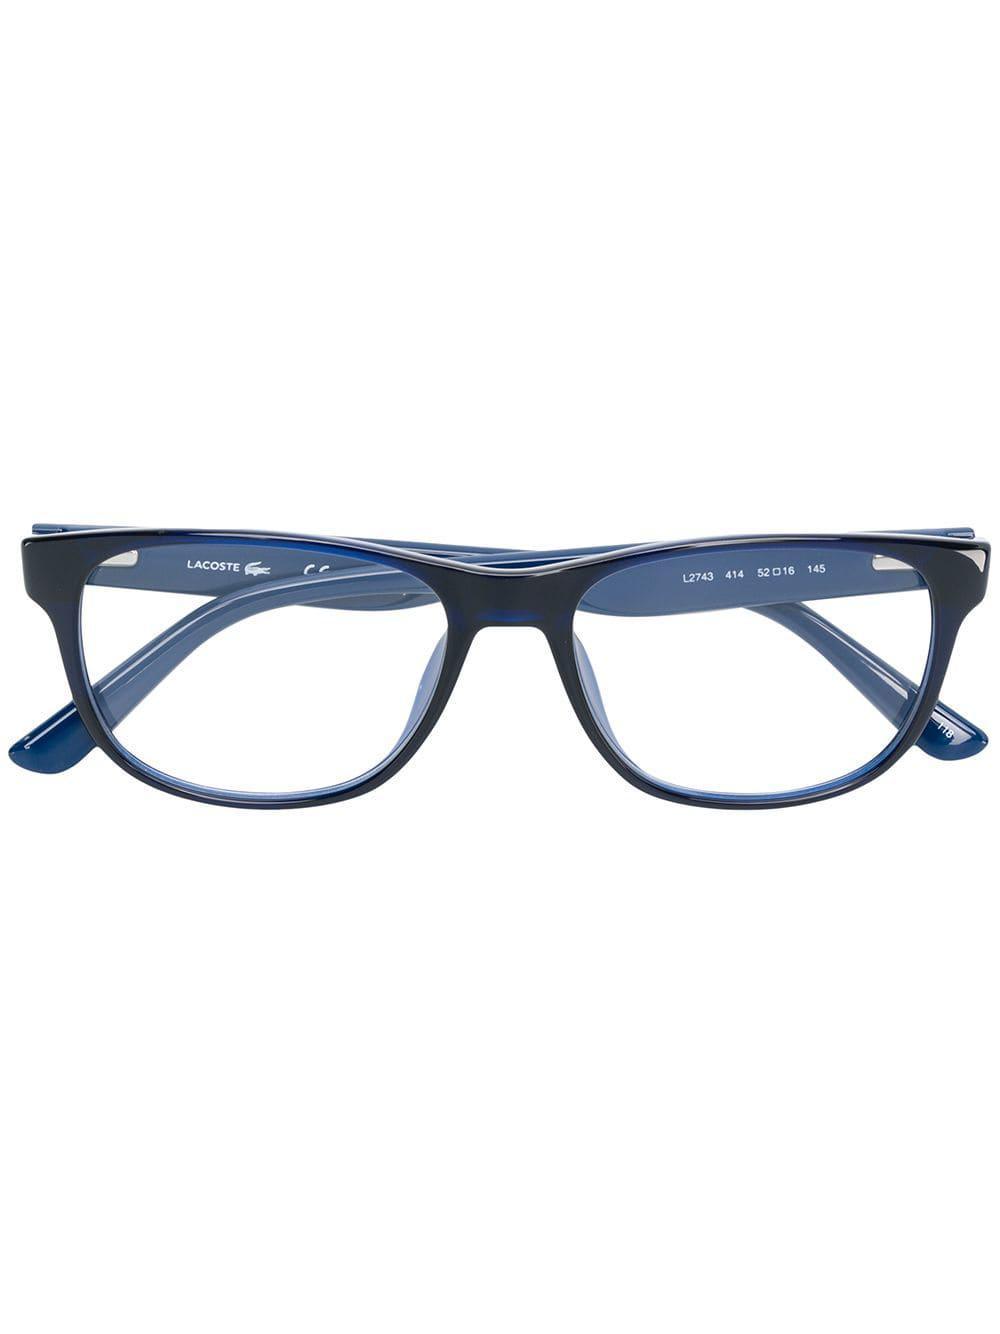 4c3c0dcb51 Lacoste Square Glasses in Blue for Men - Lyst